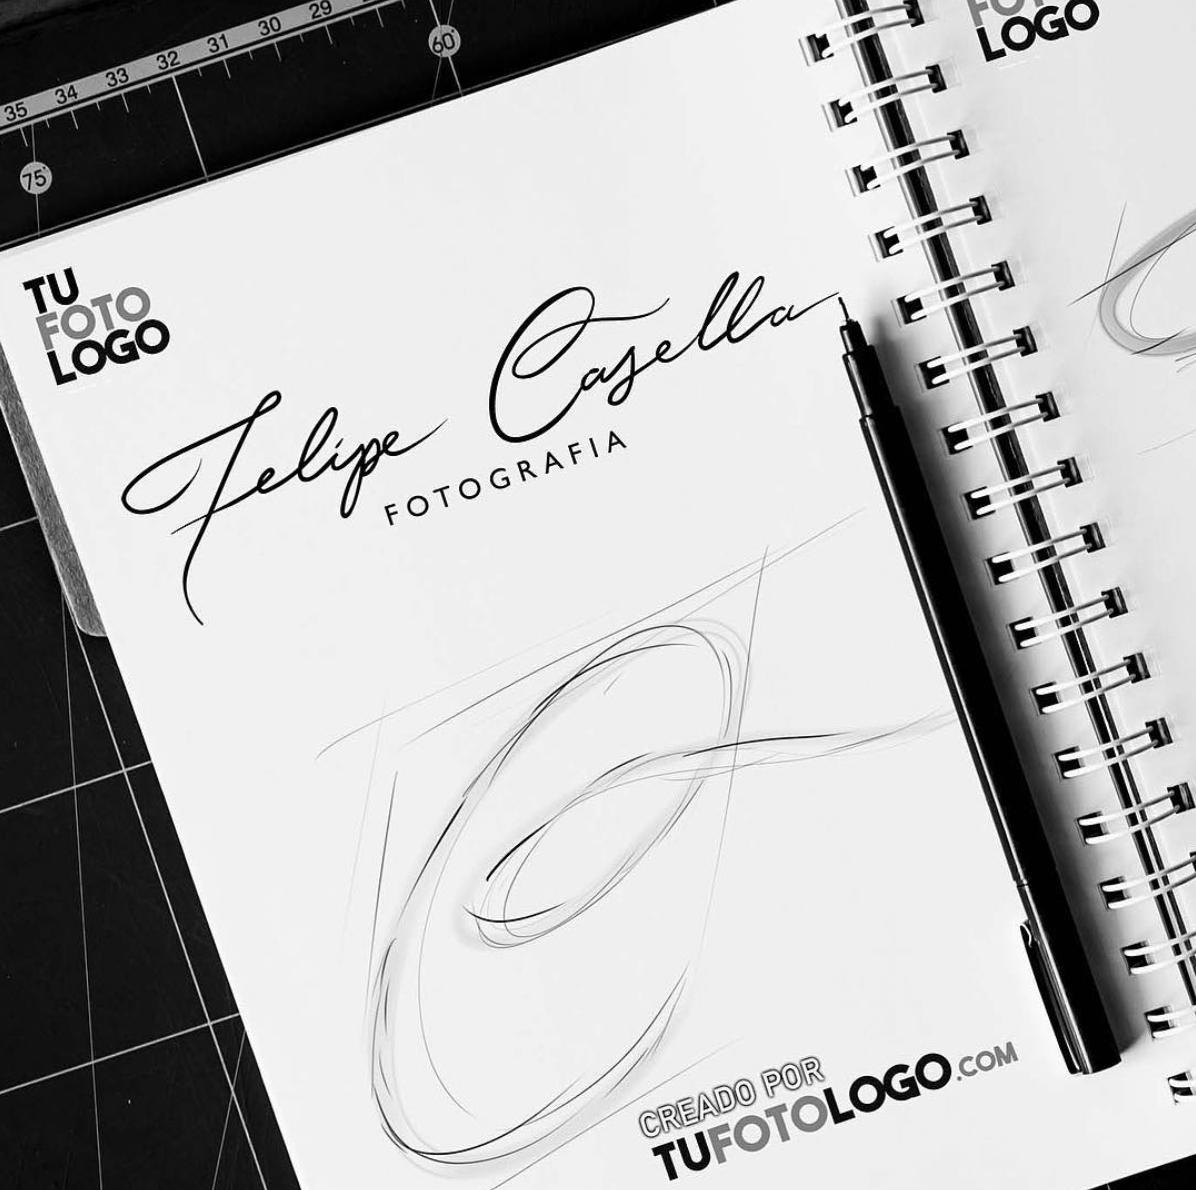 Creamos la firma de Felipe Casella